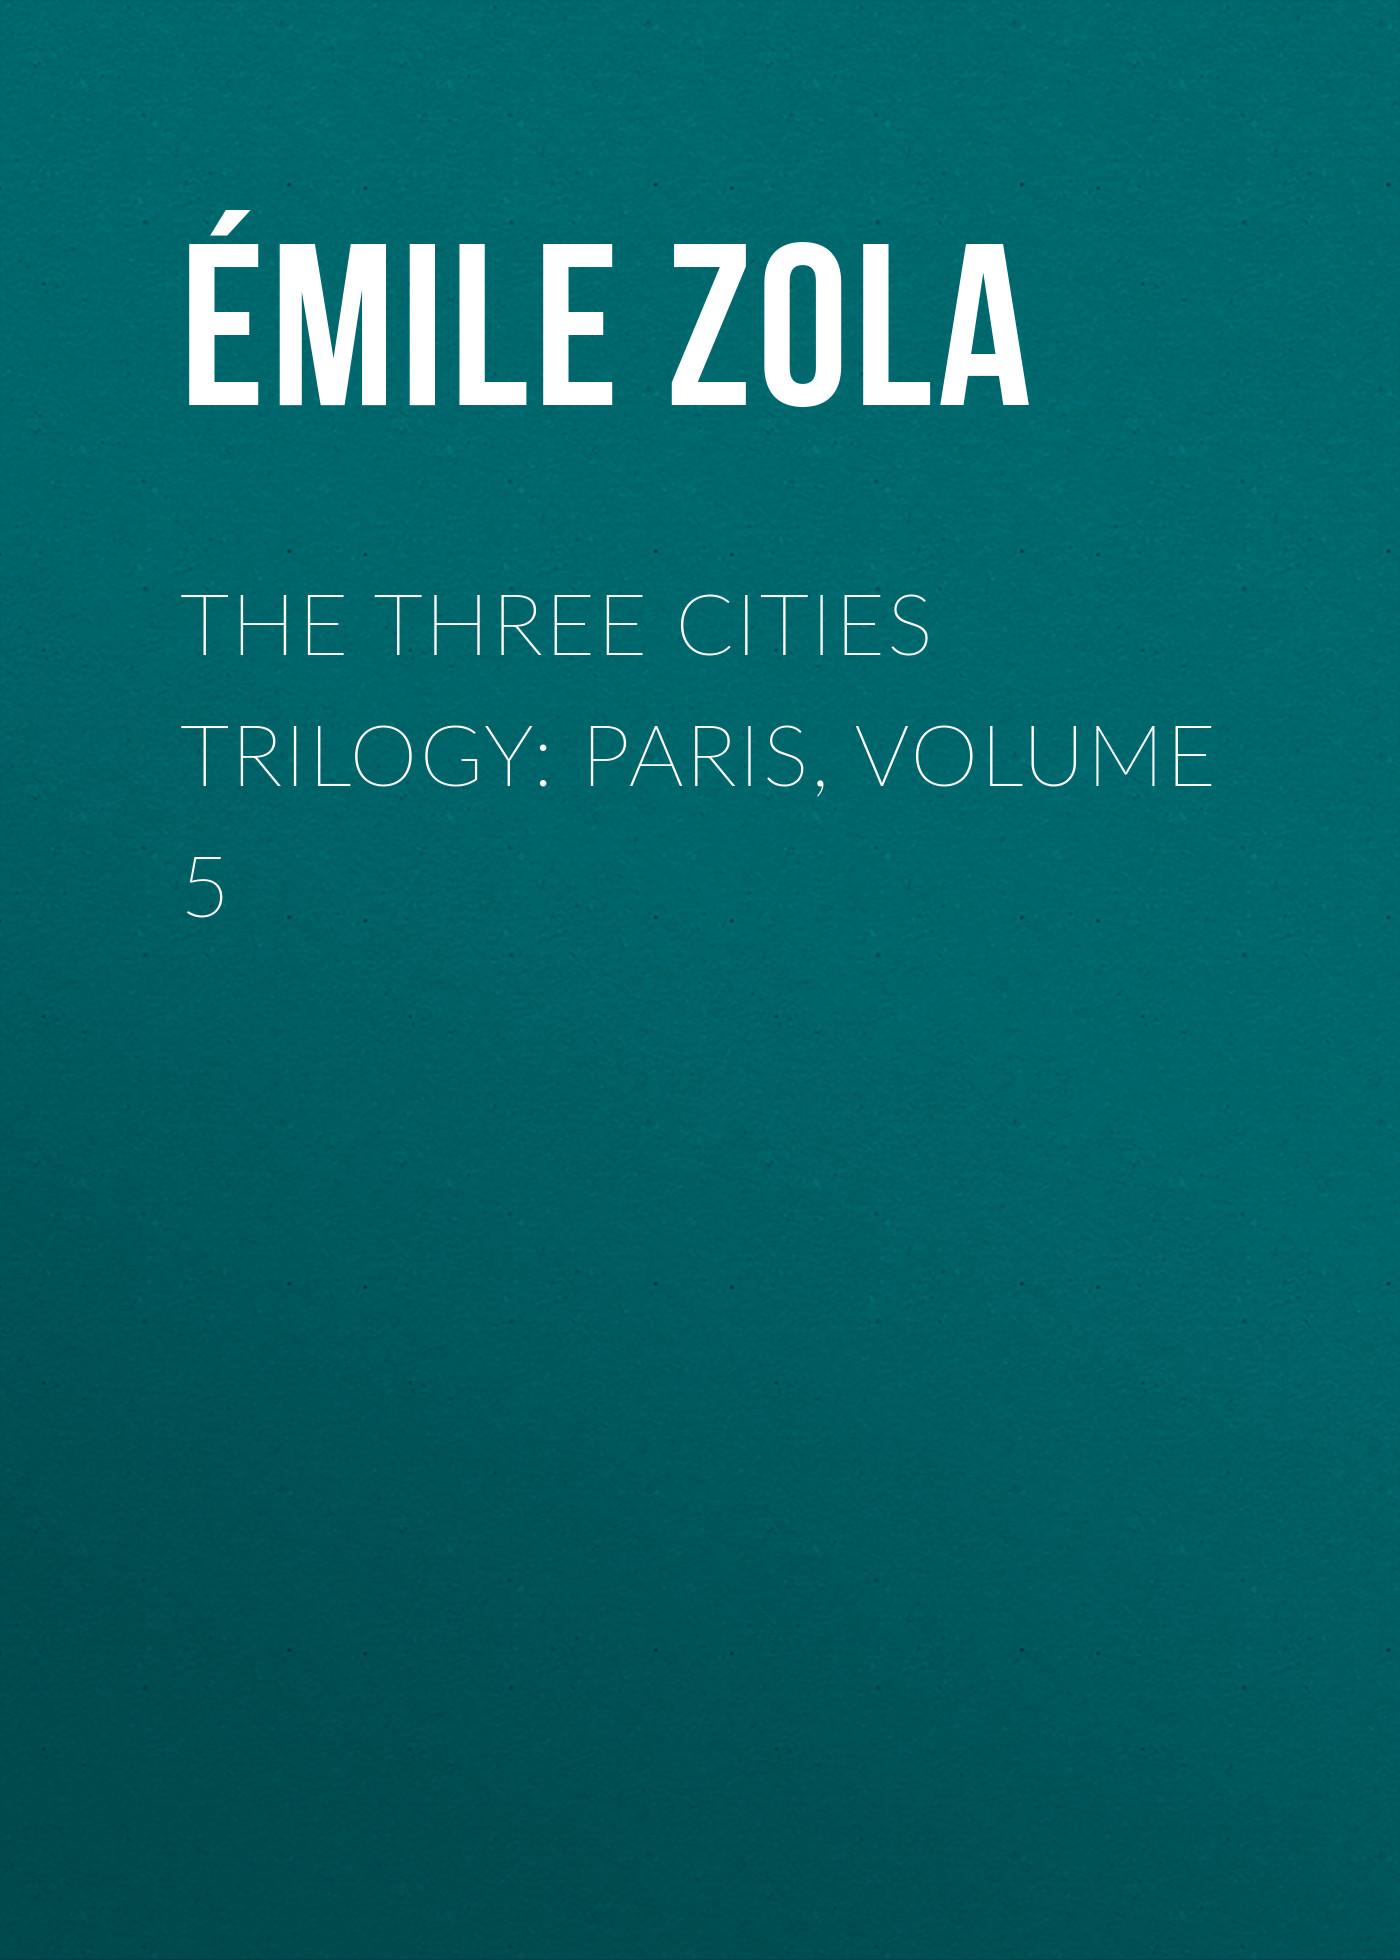 Эмиль Золя The Three Cities Trilogy: Paris, Volume 5 эмиль золя the three cities trilogy rome volume 5